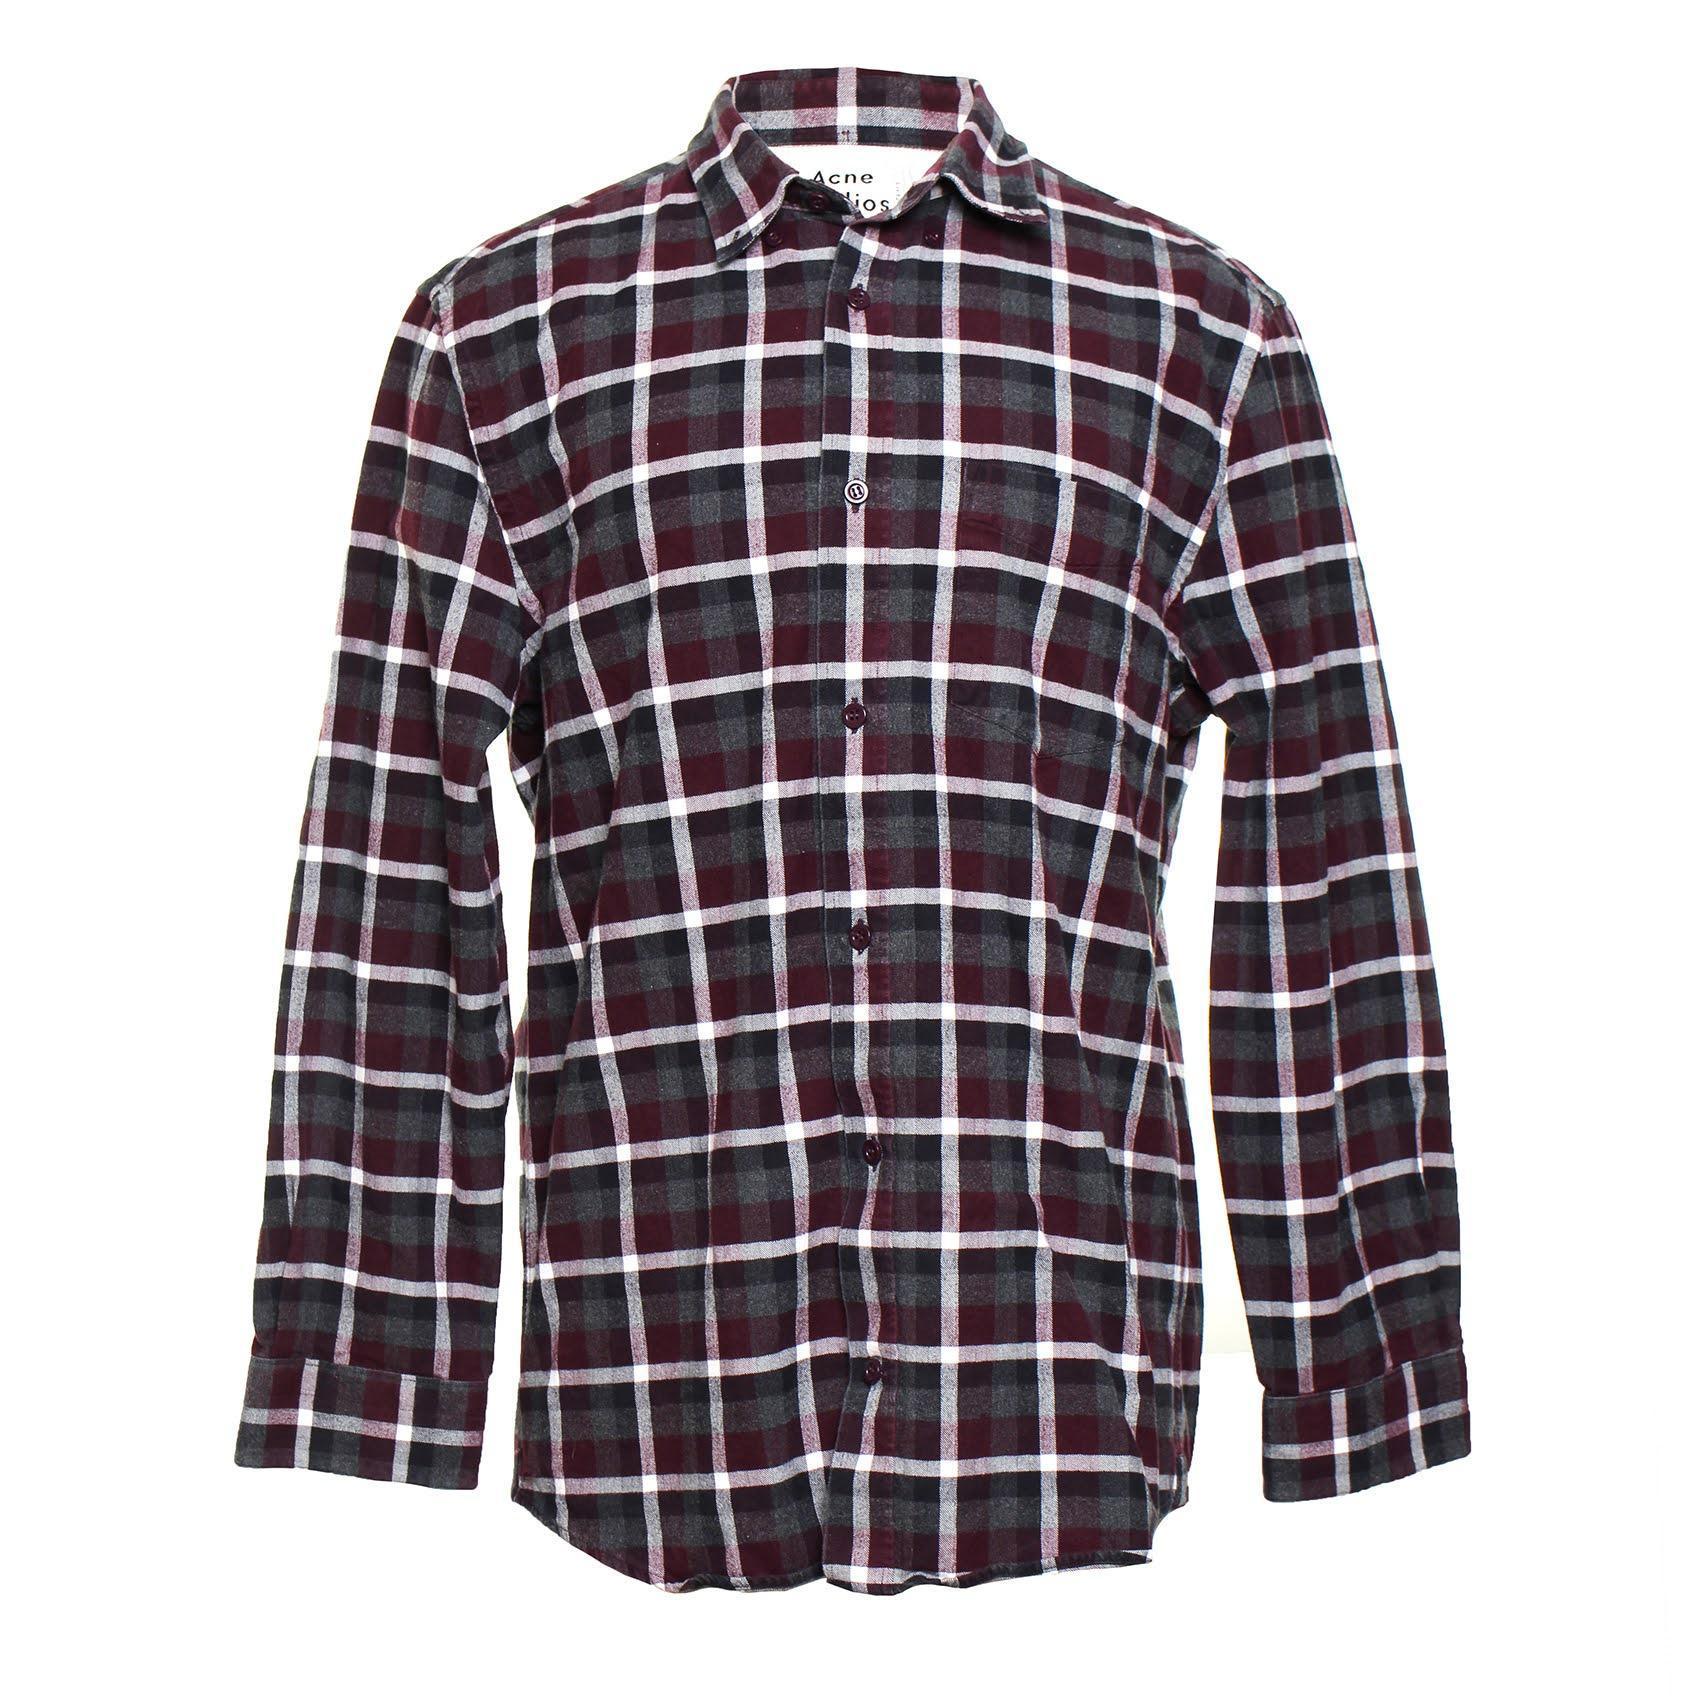 Acne Studios Size Medium Flannel